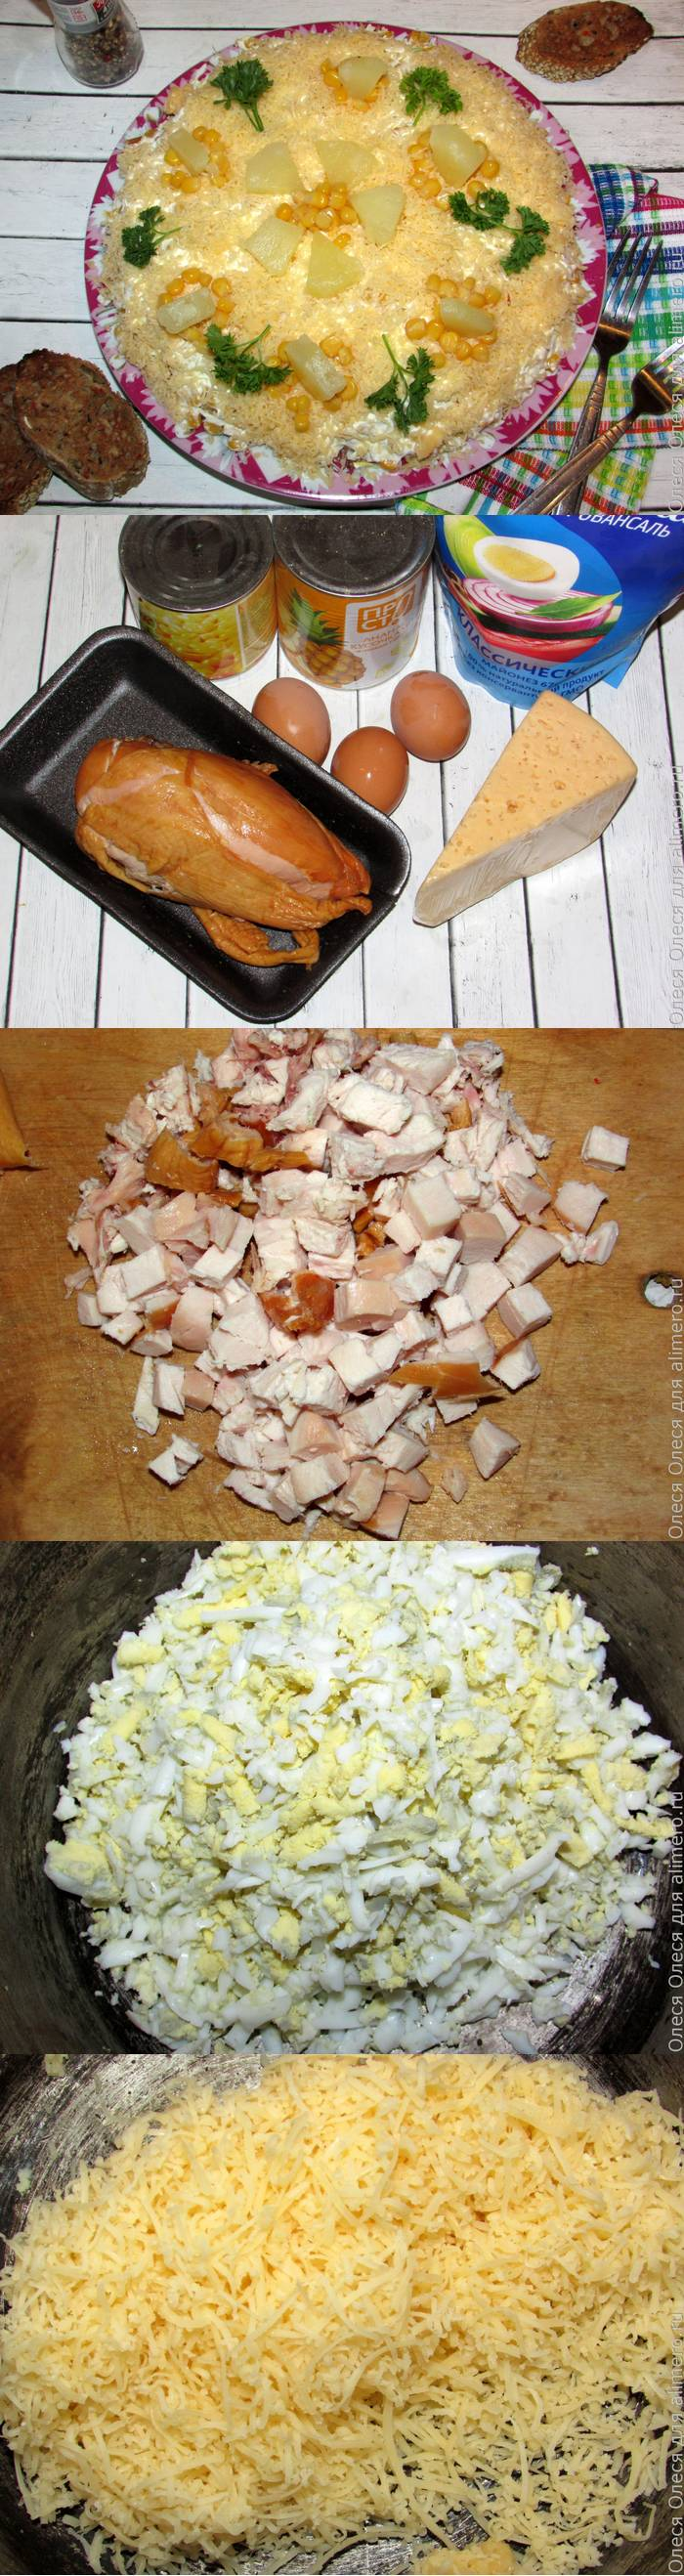 Рецепт салата курица с ананасом классический пошагово